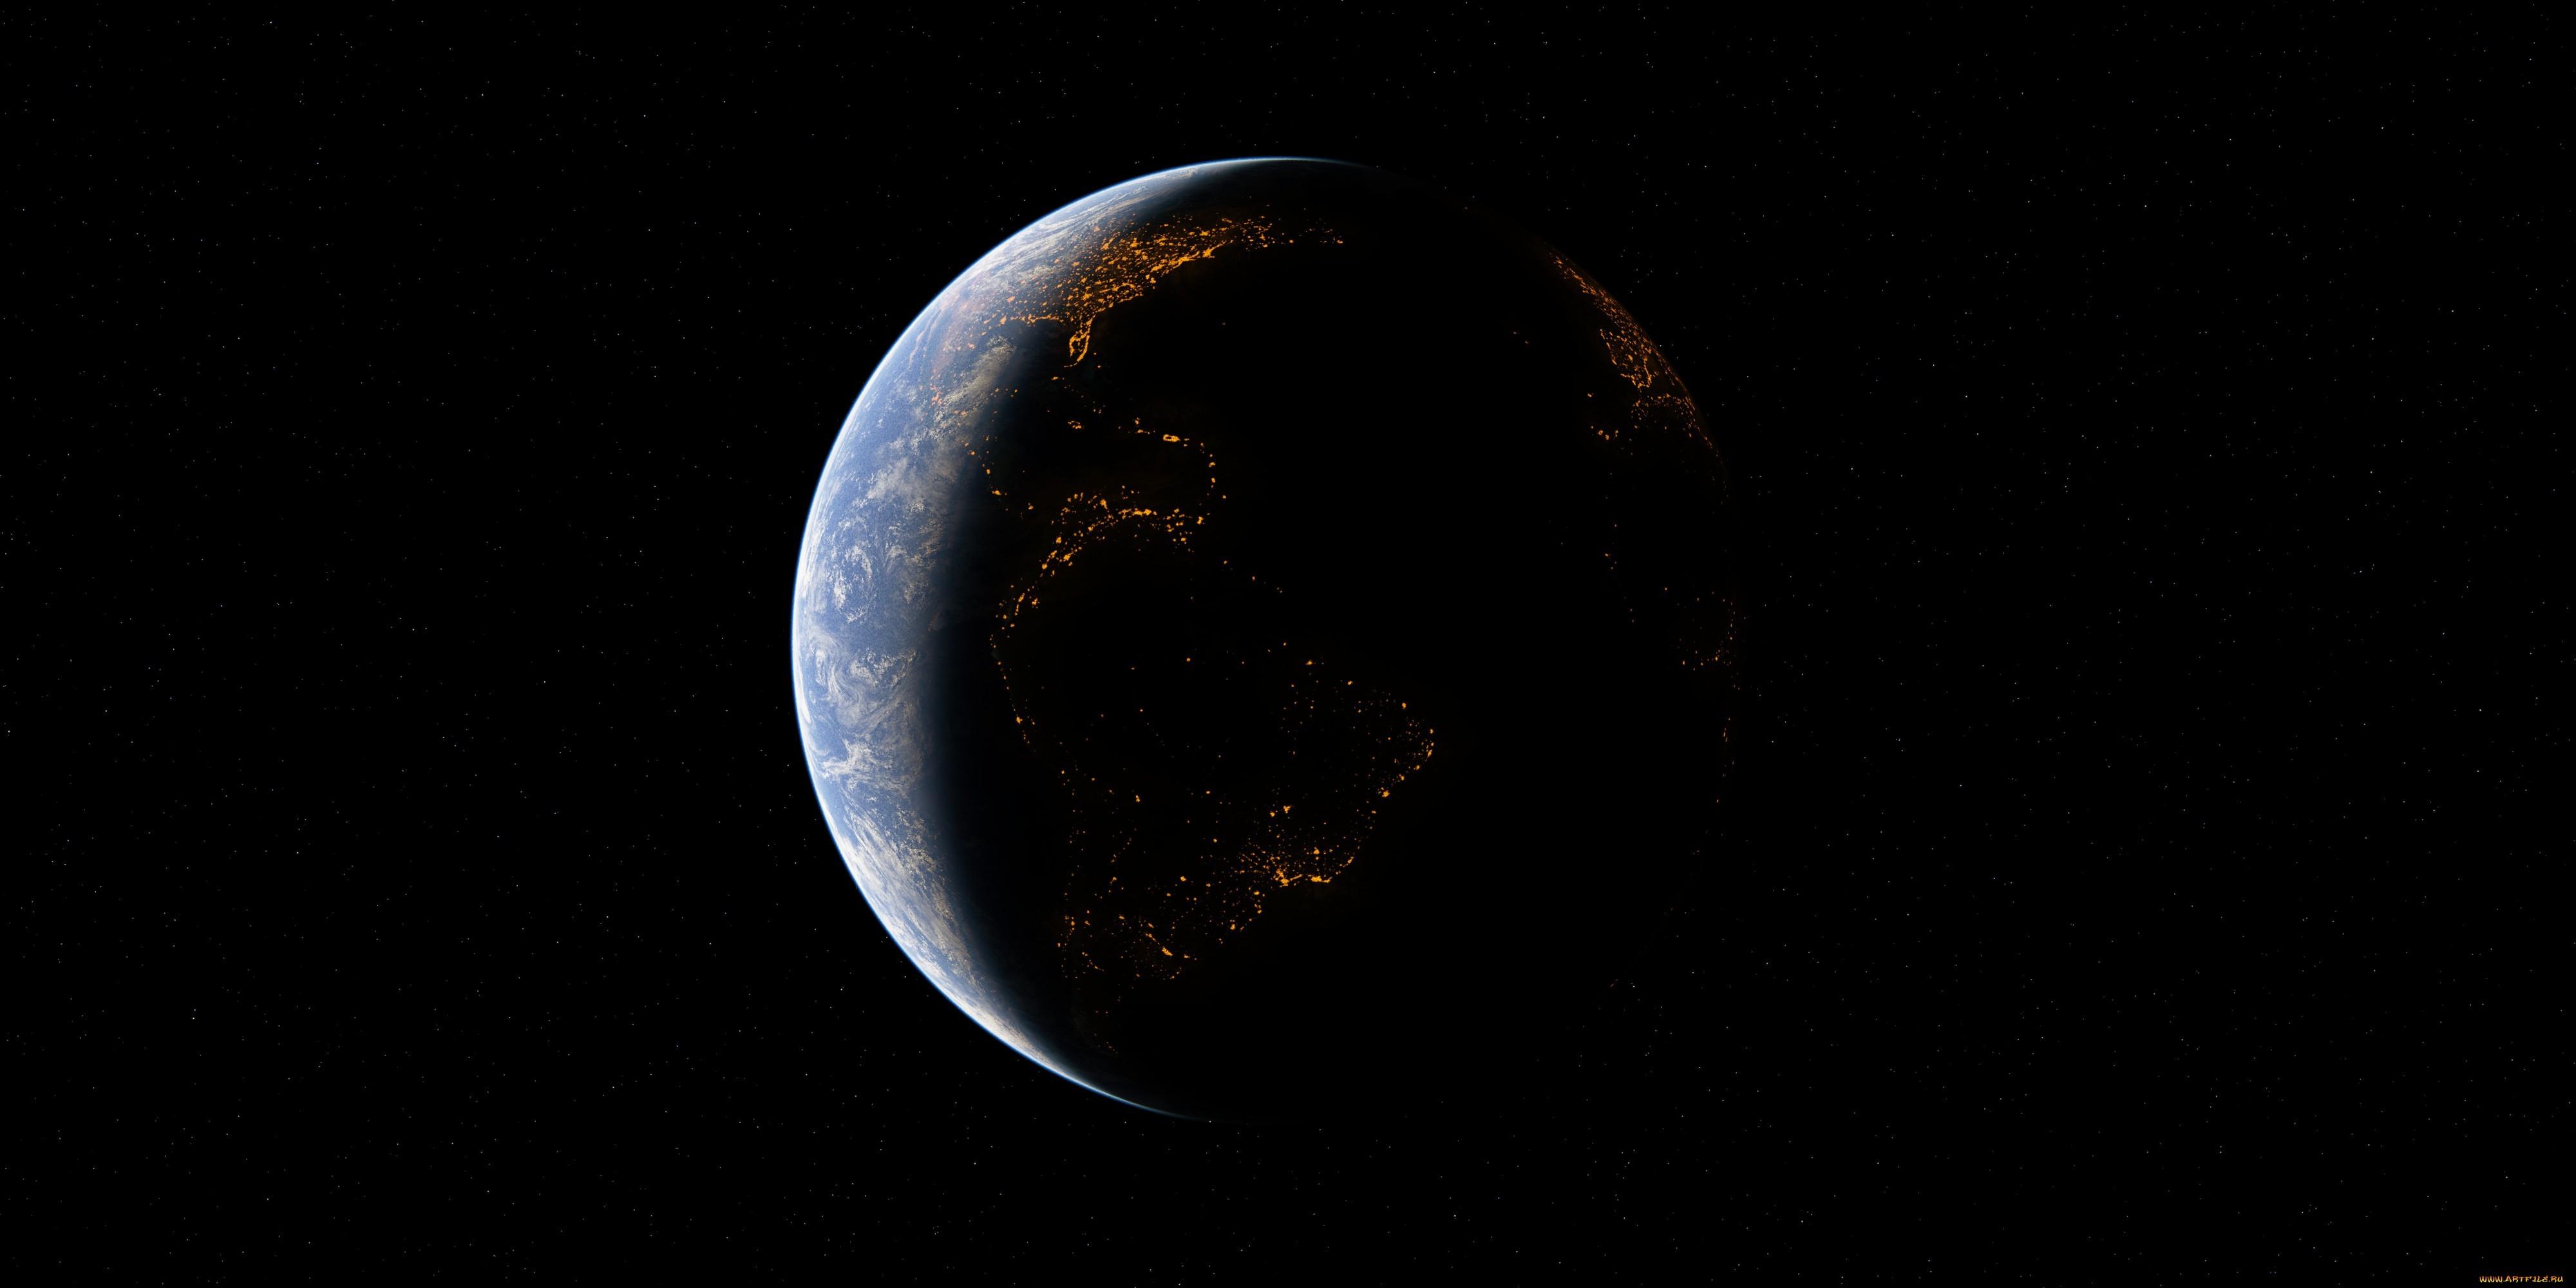 General 4000x2000 space planet space art digital art